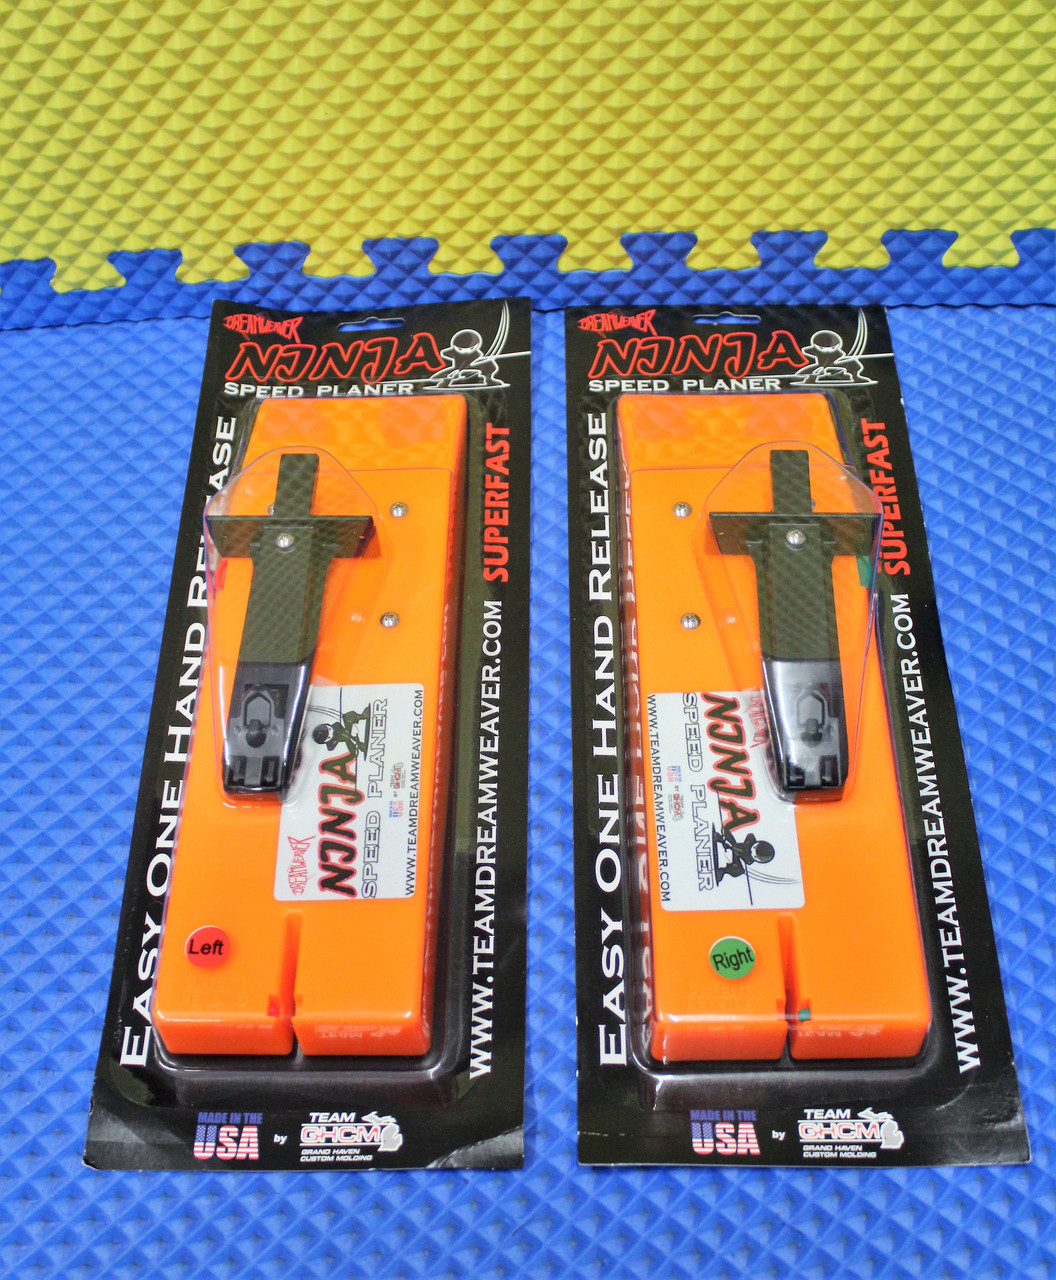 Dreamweaver Ninja Speed Planer Boards LEFT NJ911-L And RIGHT NJ911-R